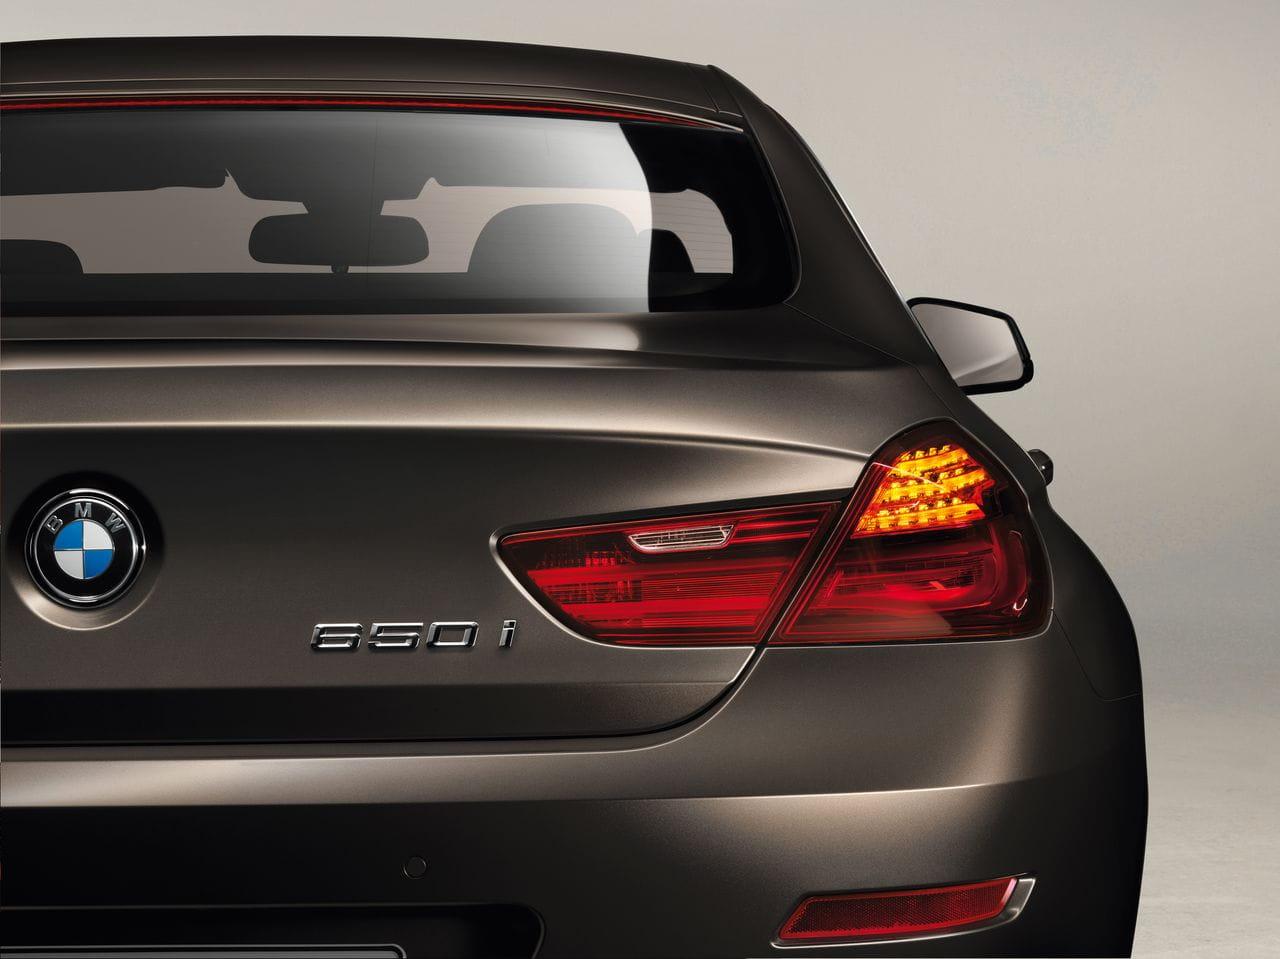 bmw-serie-6-gran-coupe-oficial-33